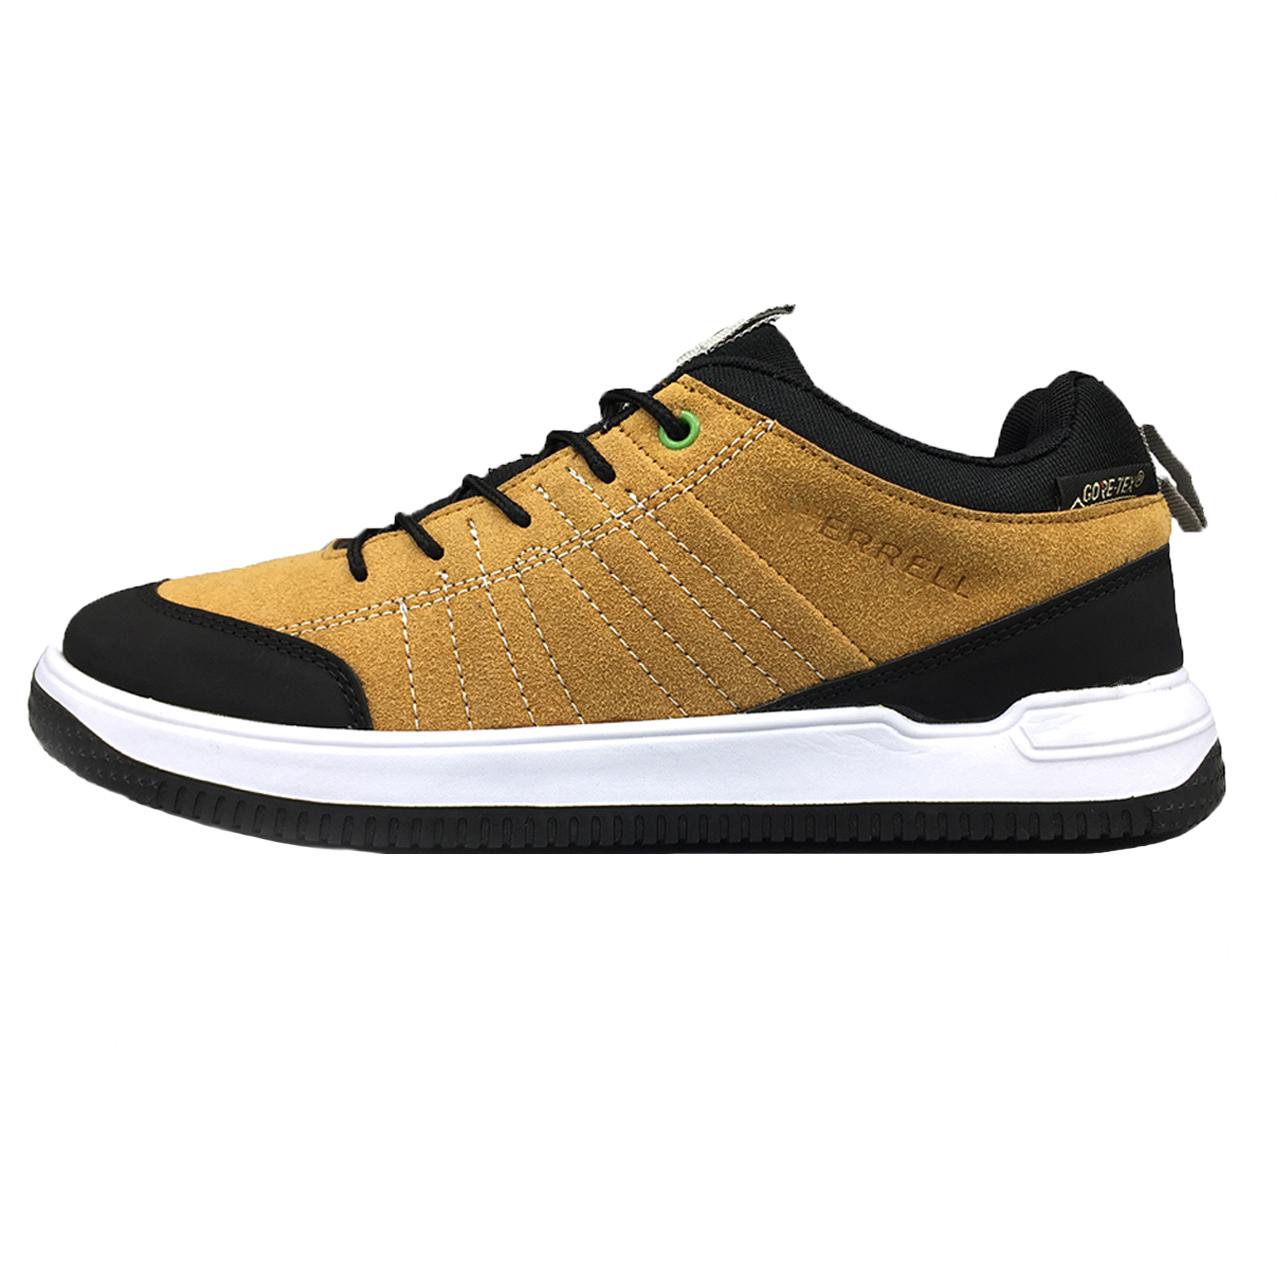 کفش راحتی مدل GORE-TEX-AS